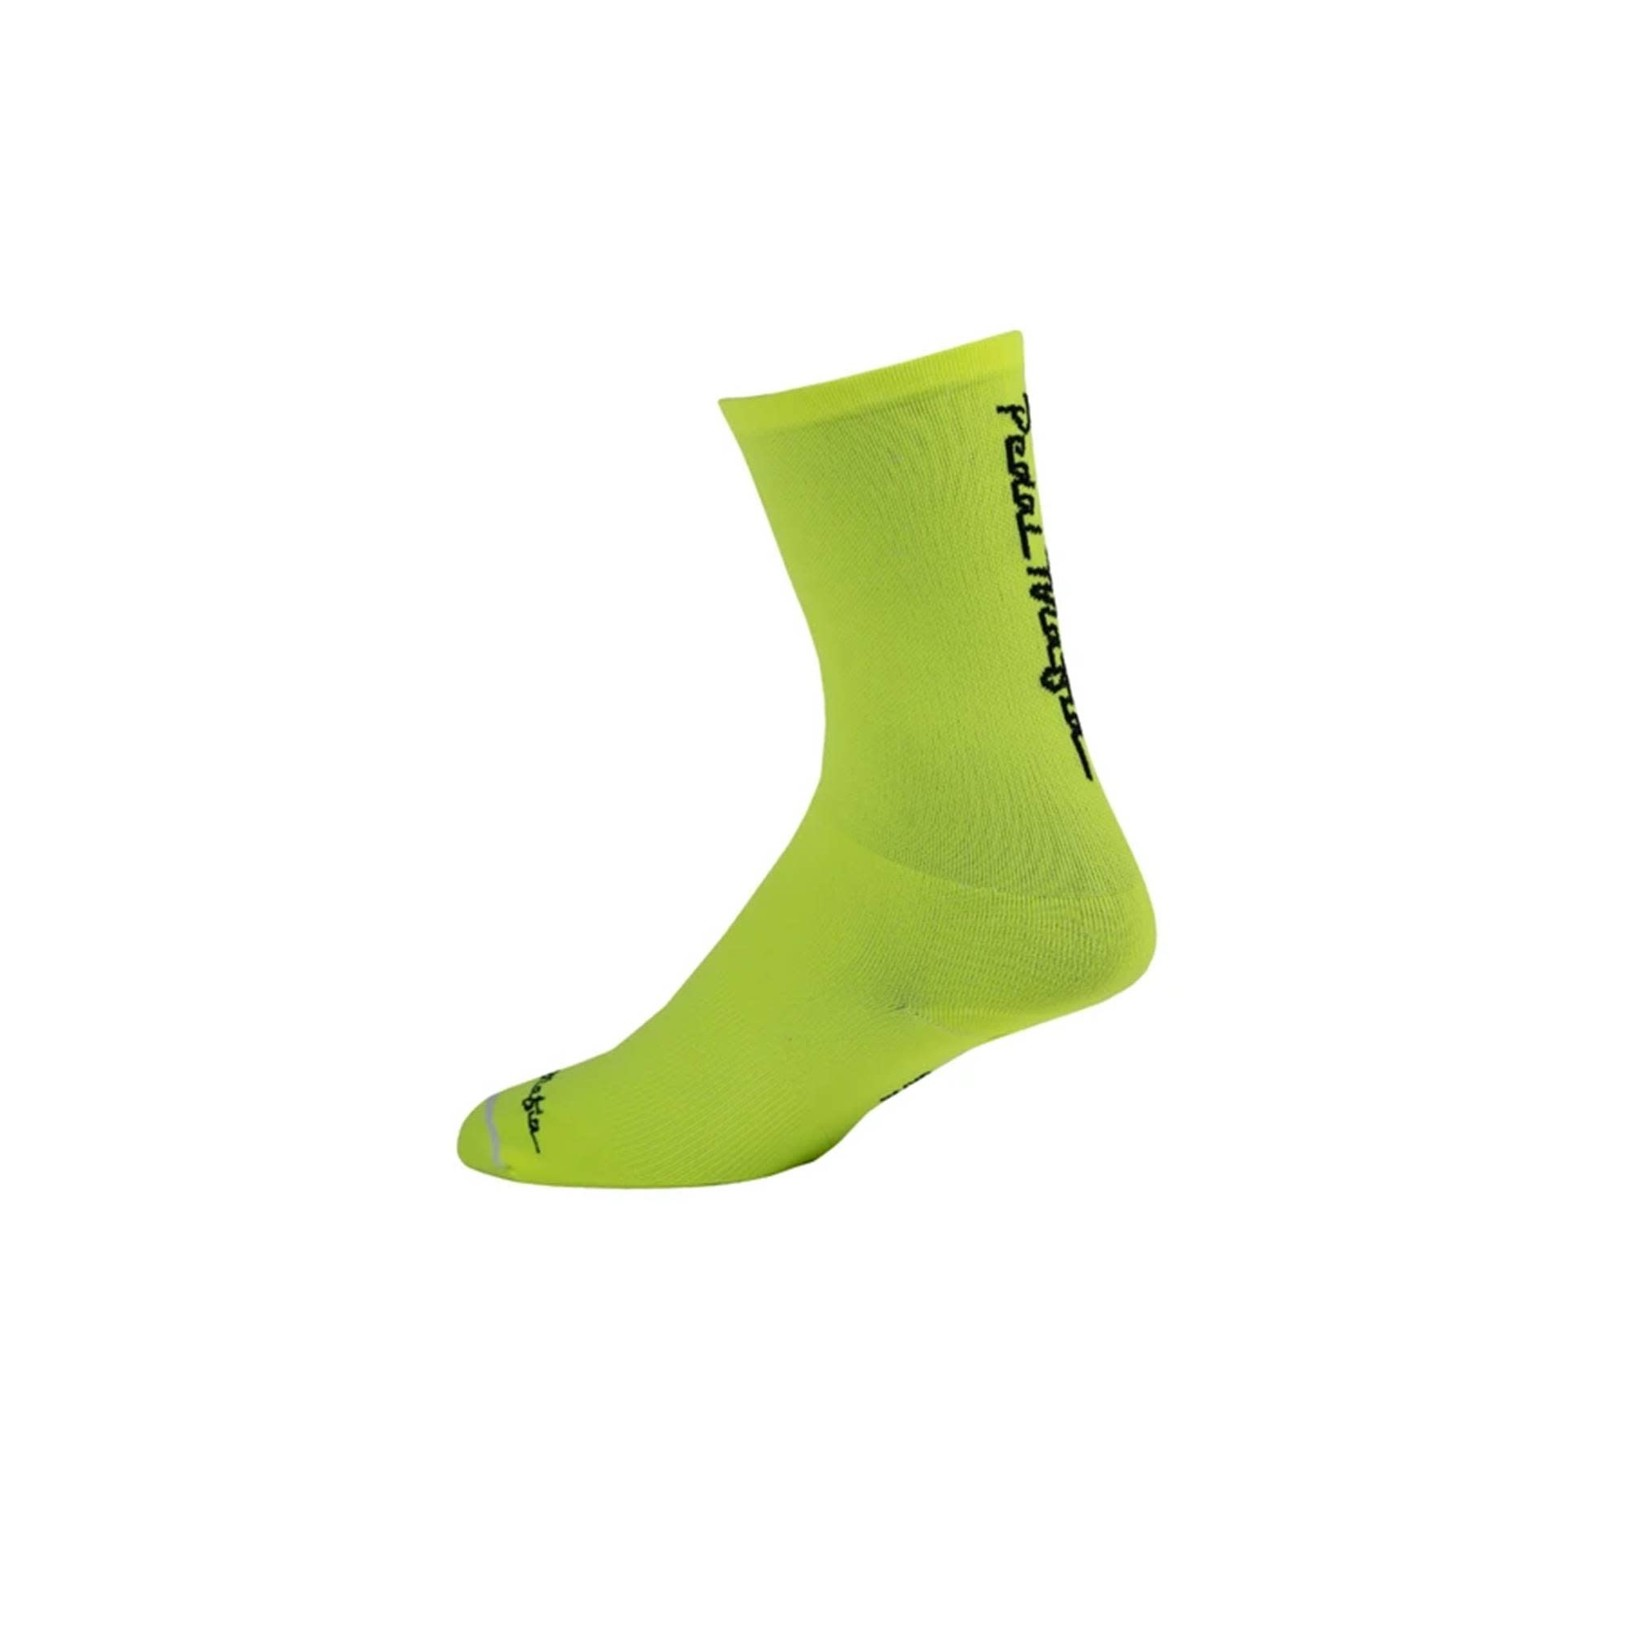 Pedal Mafia HV Yellow Sock